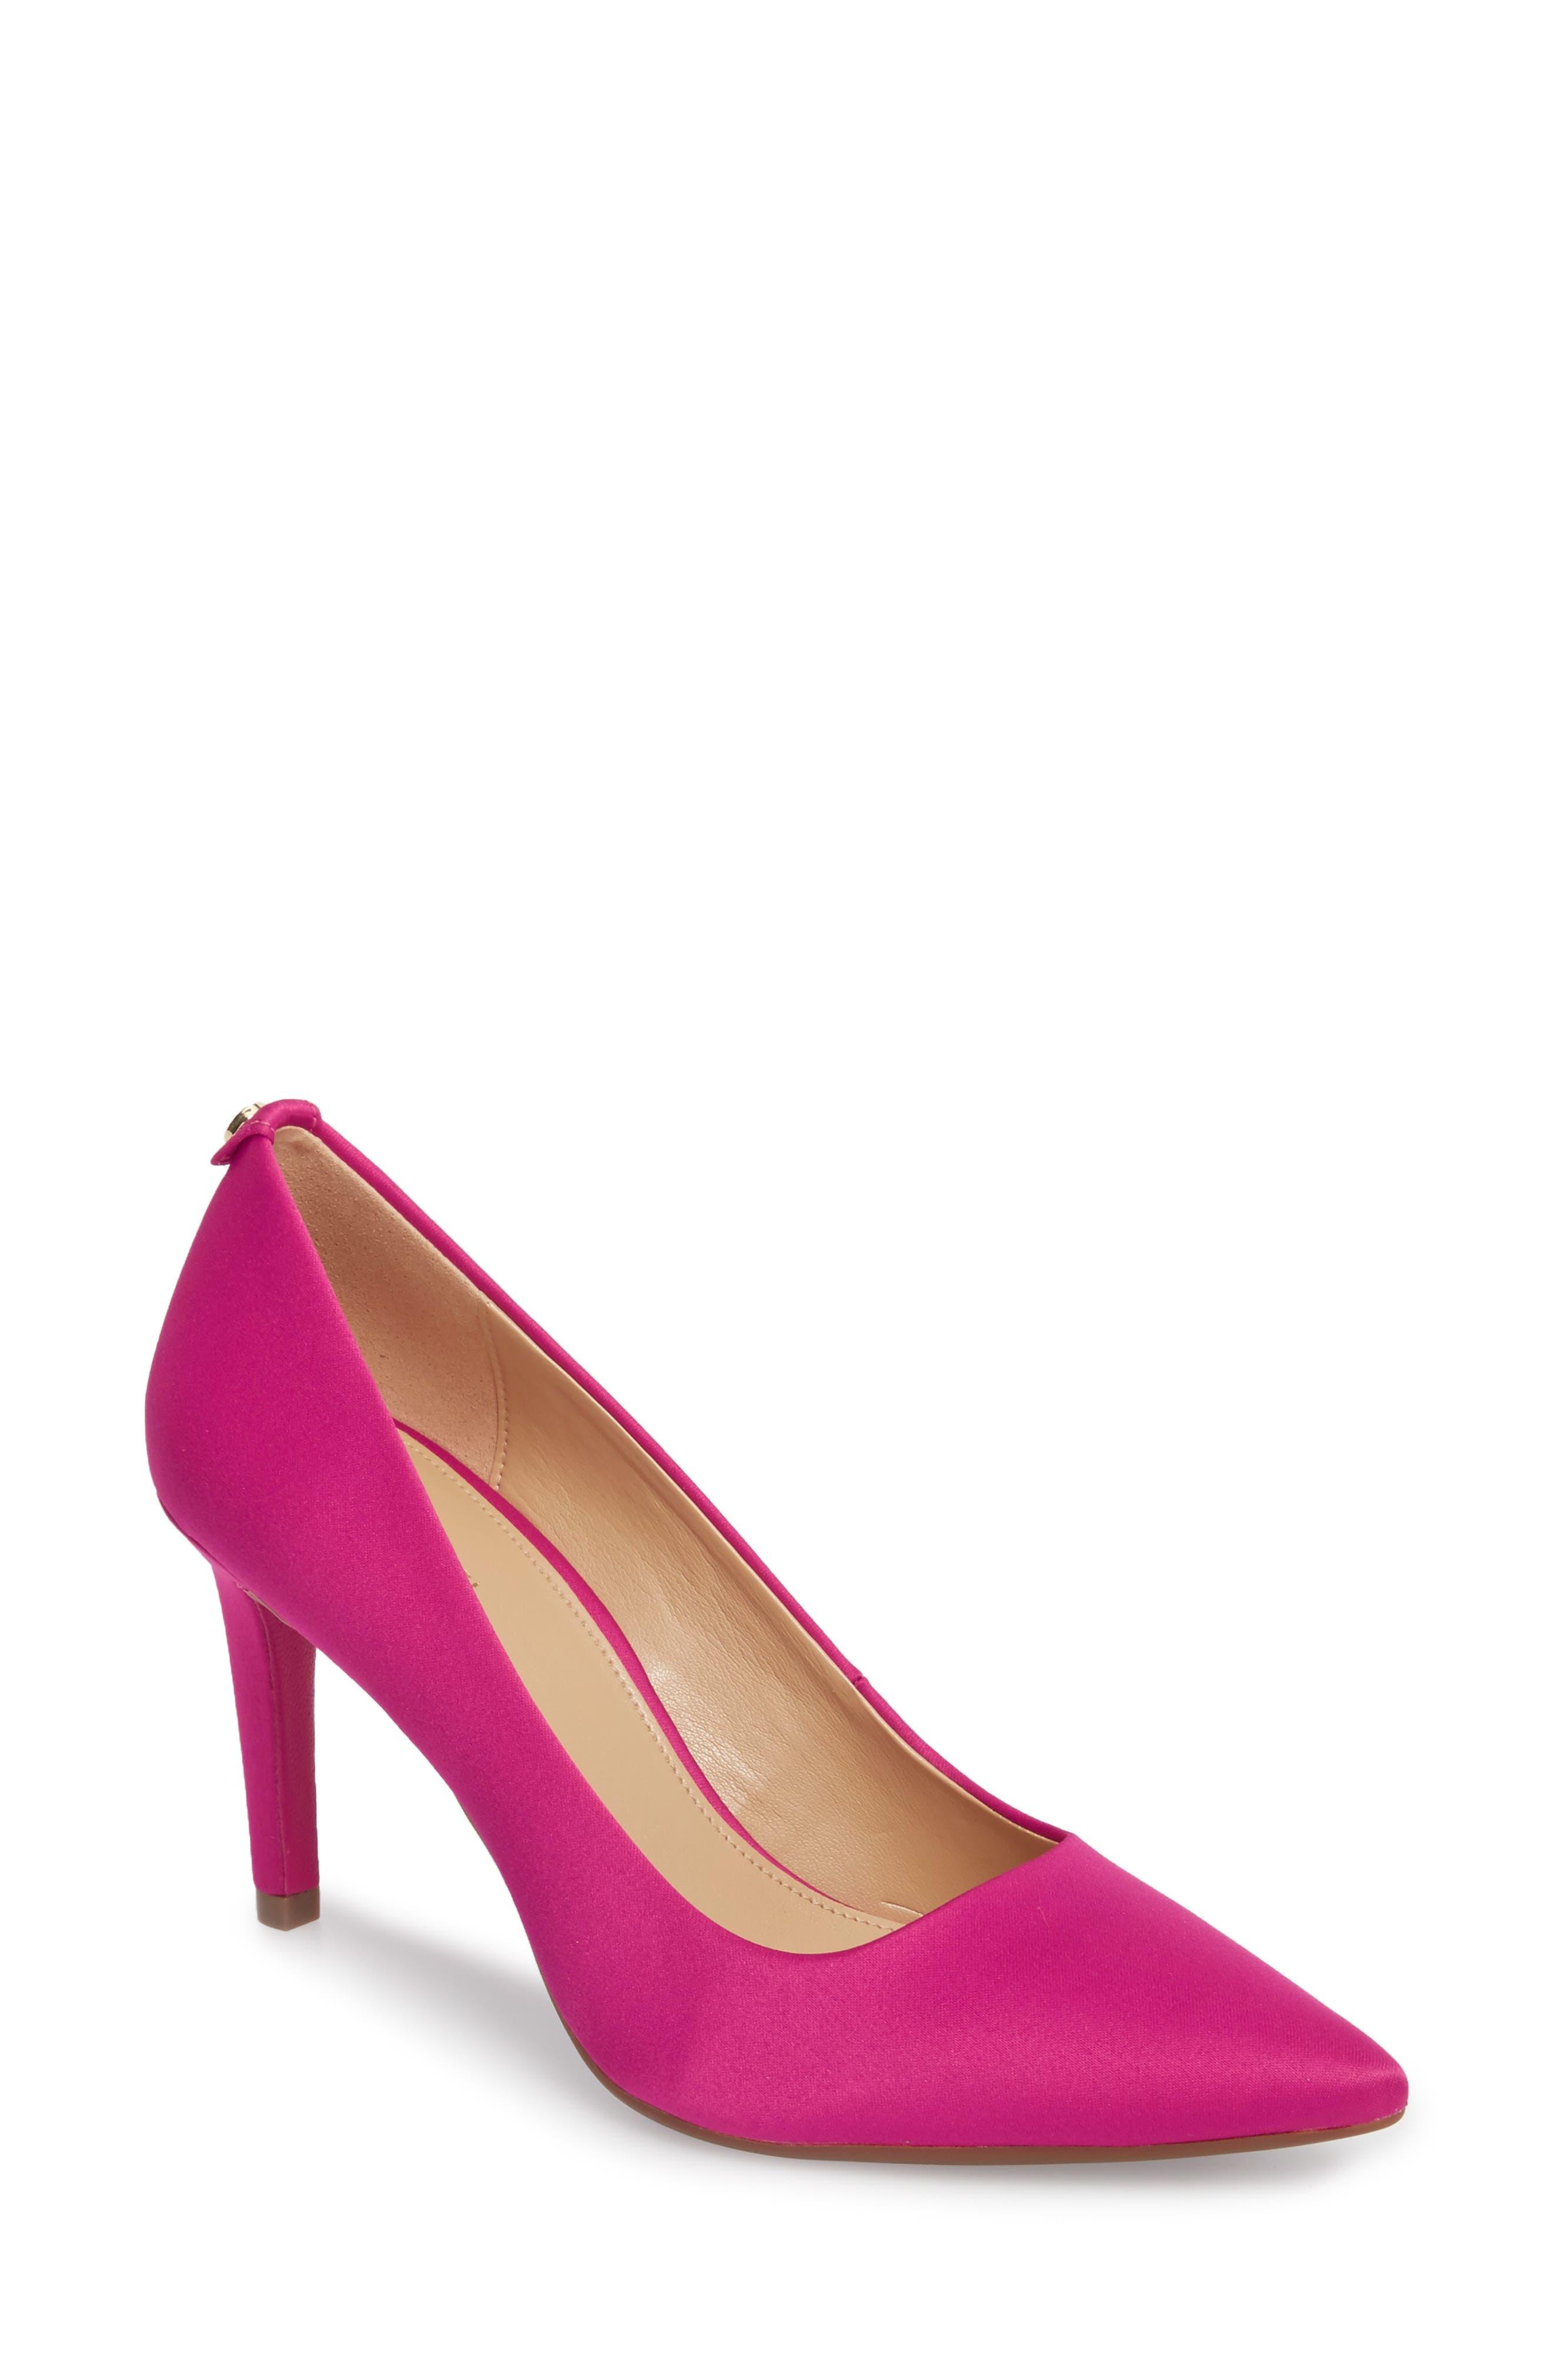 Dorothy Flex Pump,                             Main thumbnail 1, color,                             Ultra Pink Satin